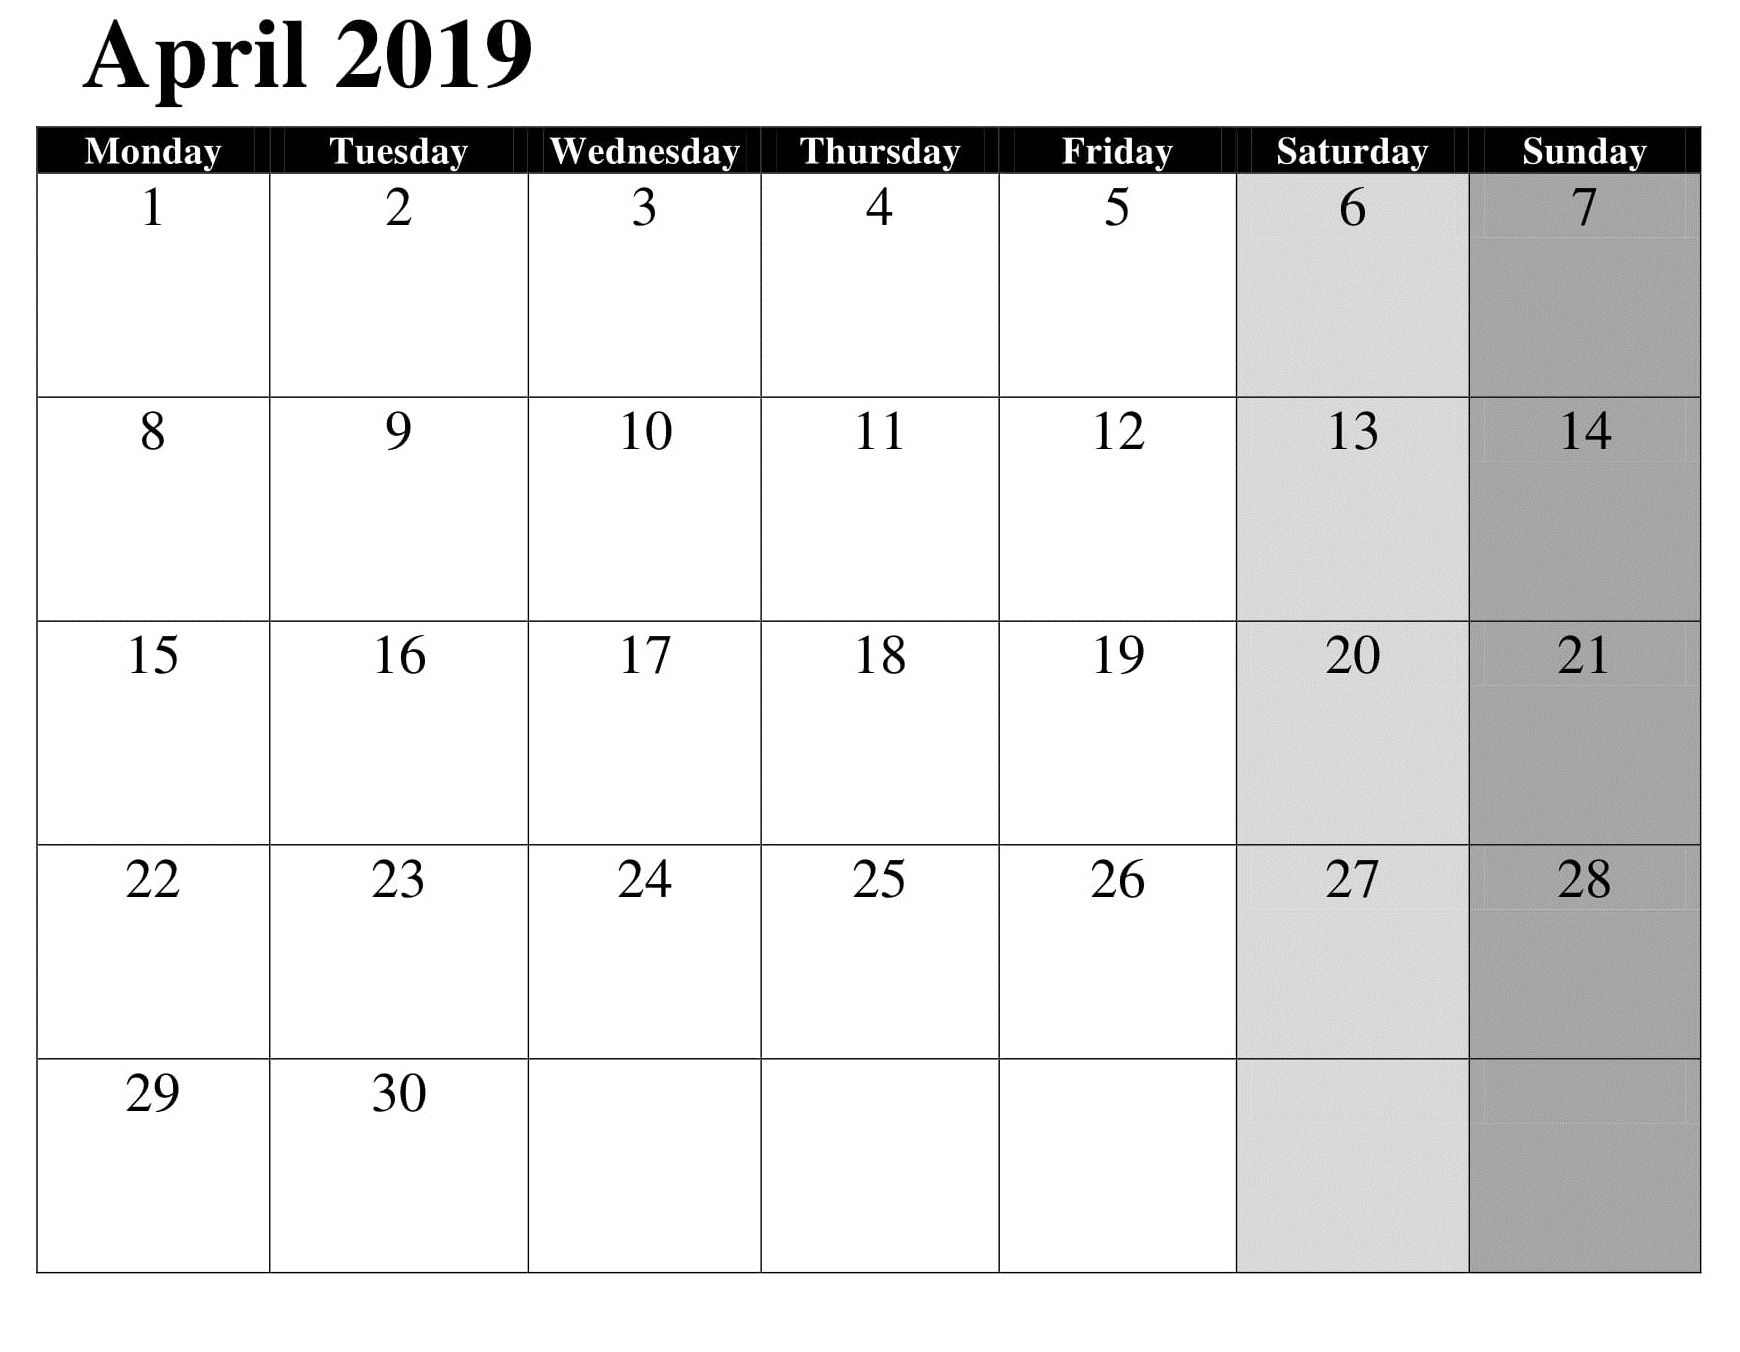 April Google Calendar Template 2019 | Daily Calendar